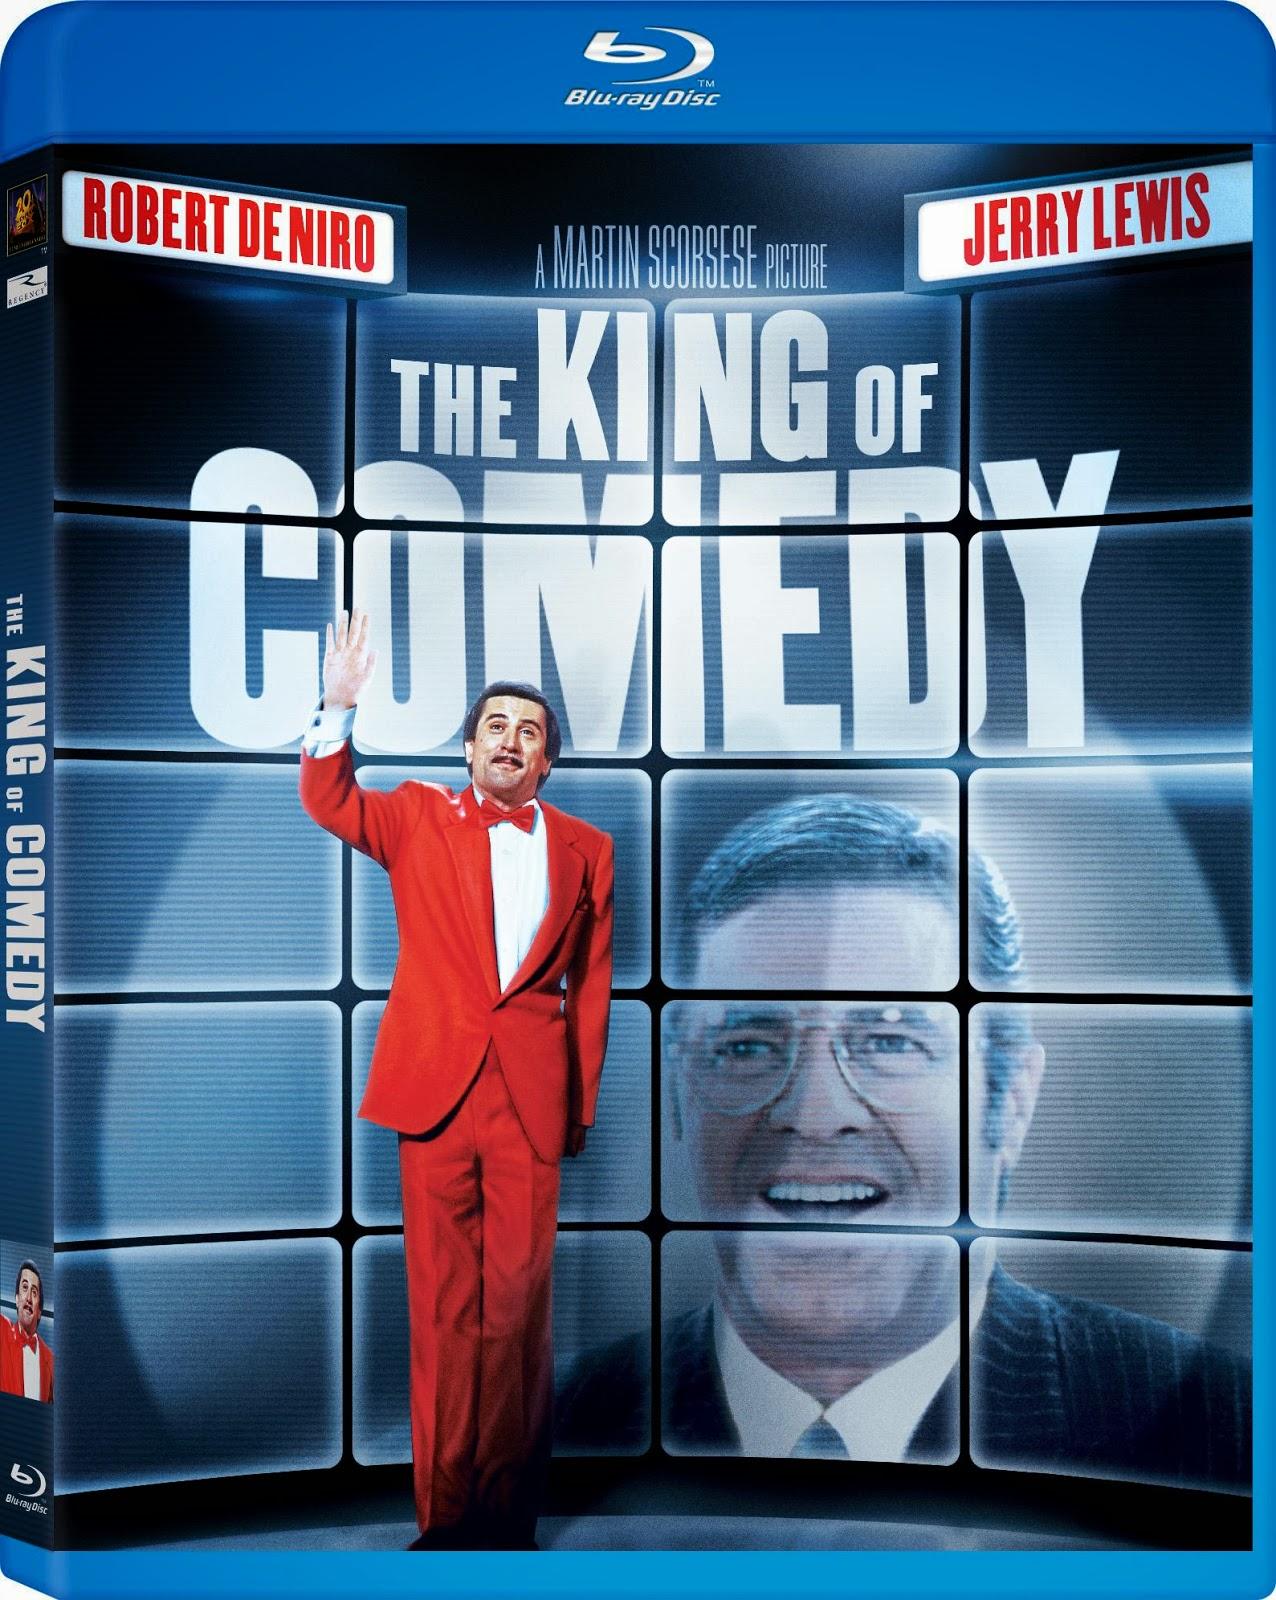 http://www.amazon.com/King-Comedy-30th-Anniversary-Blu-ray/dp/B00I4X8KU2/